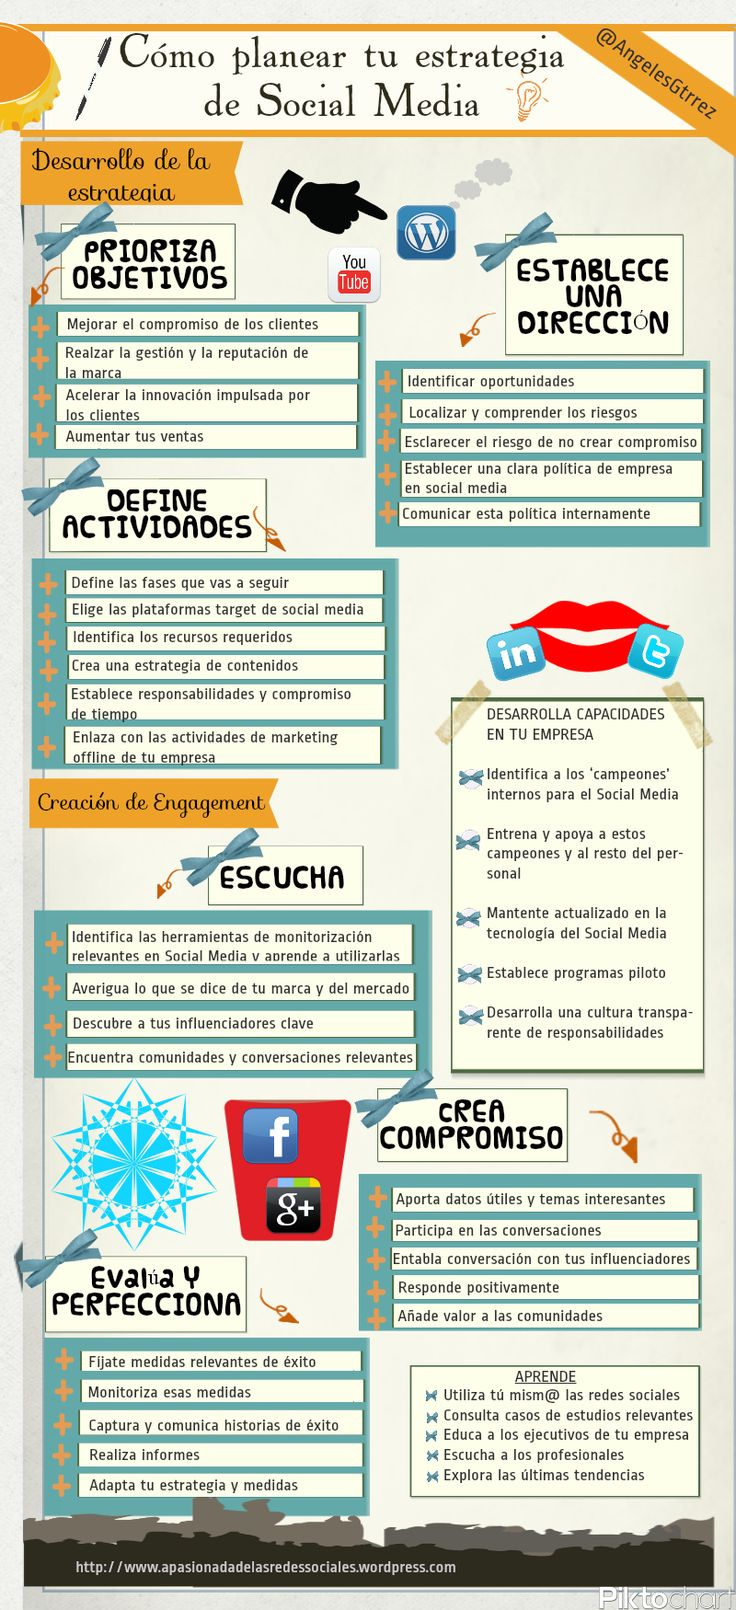 Planear estrategia Social Media (Infografía) vía @Angeles Gutiérrez Valero